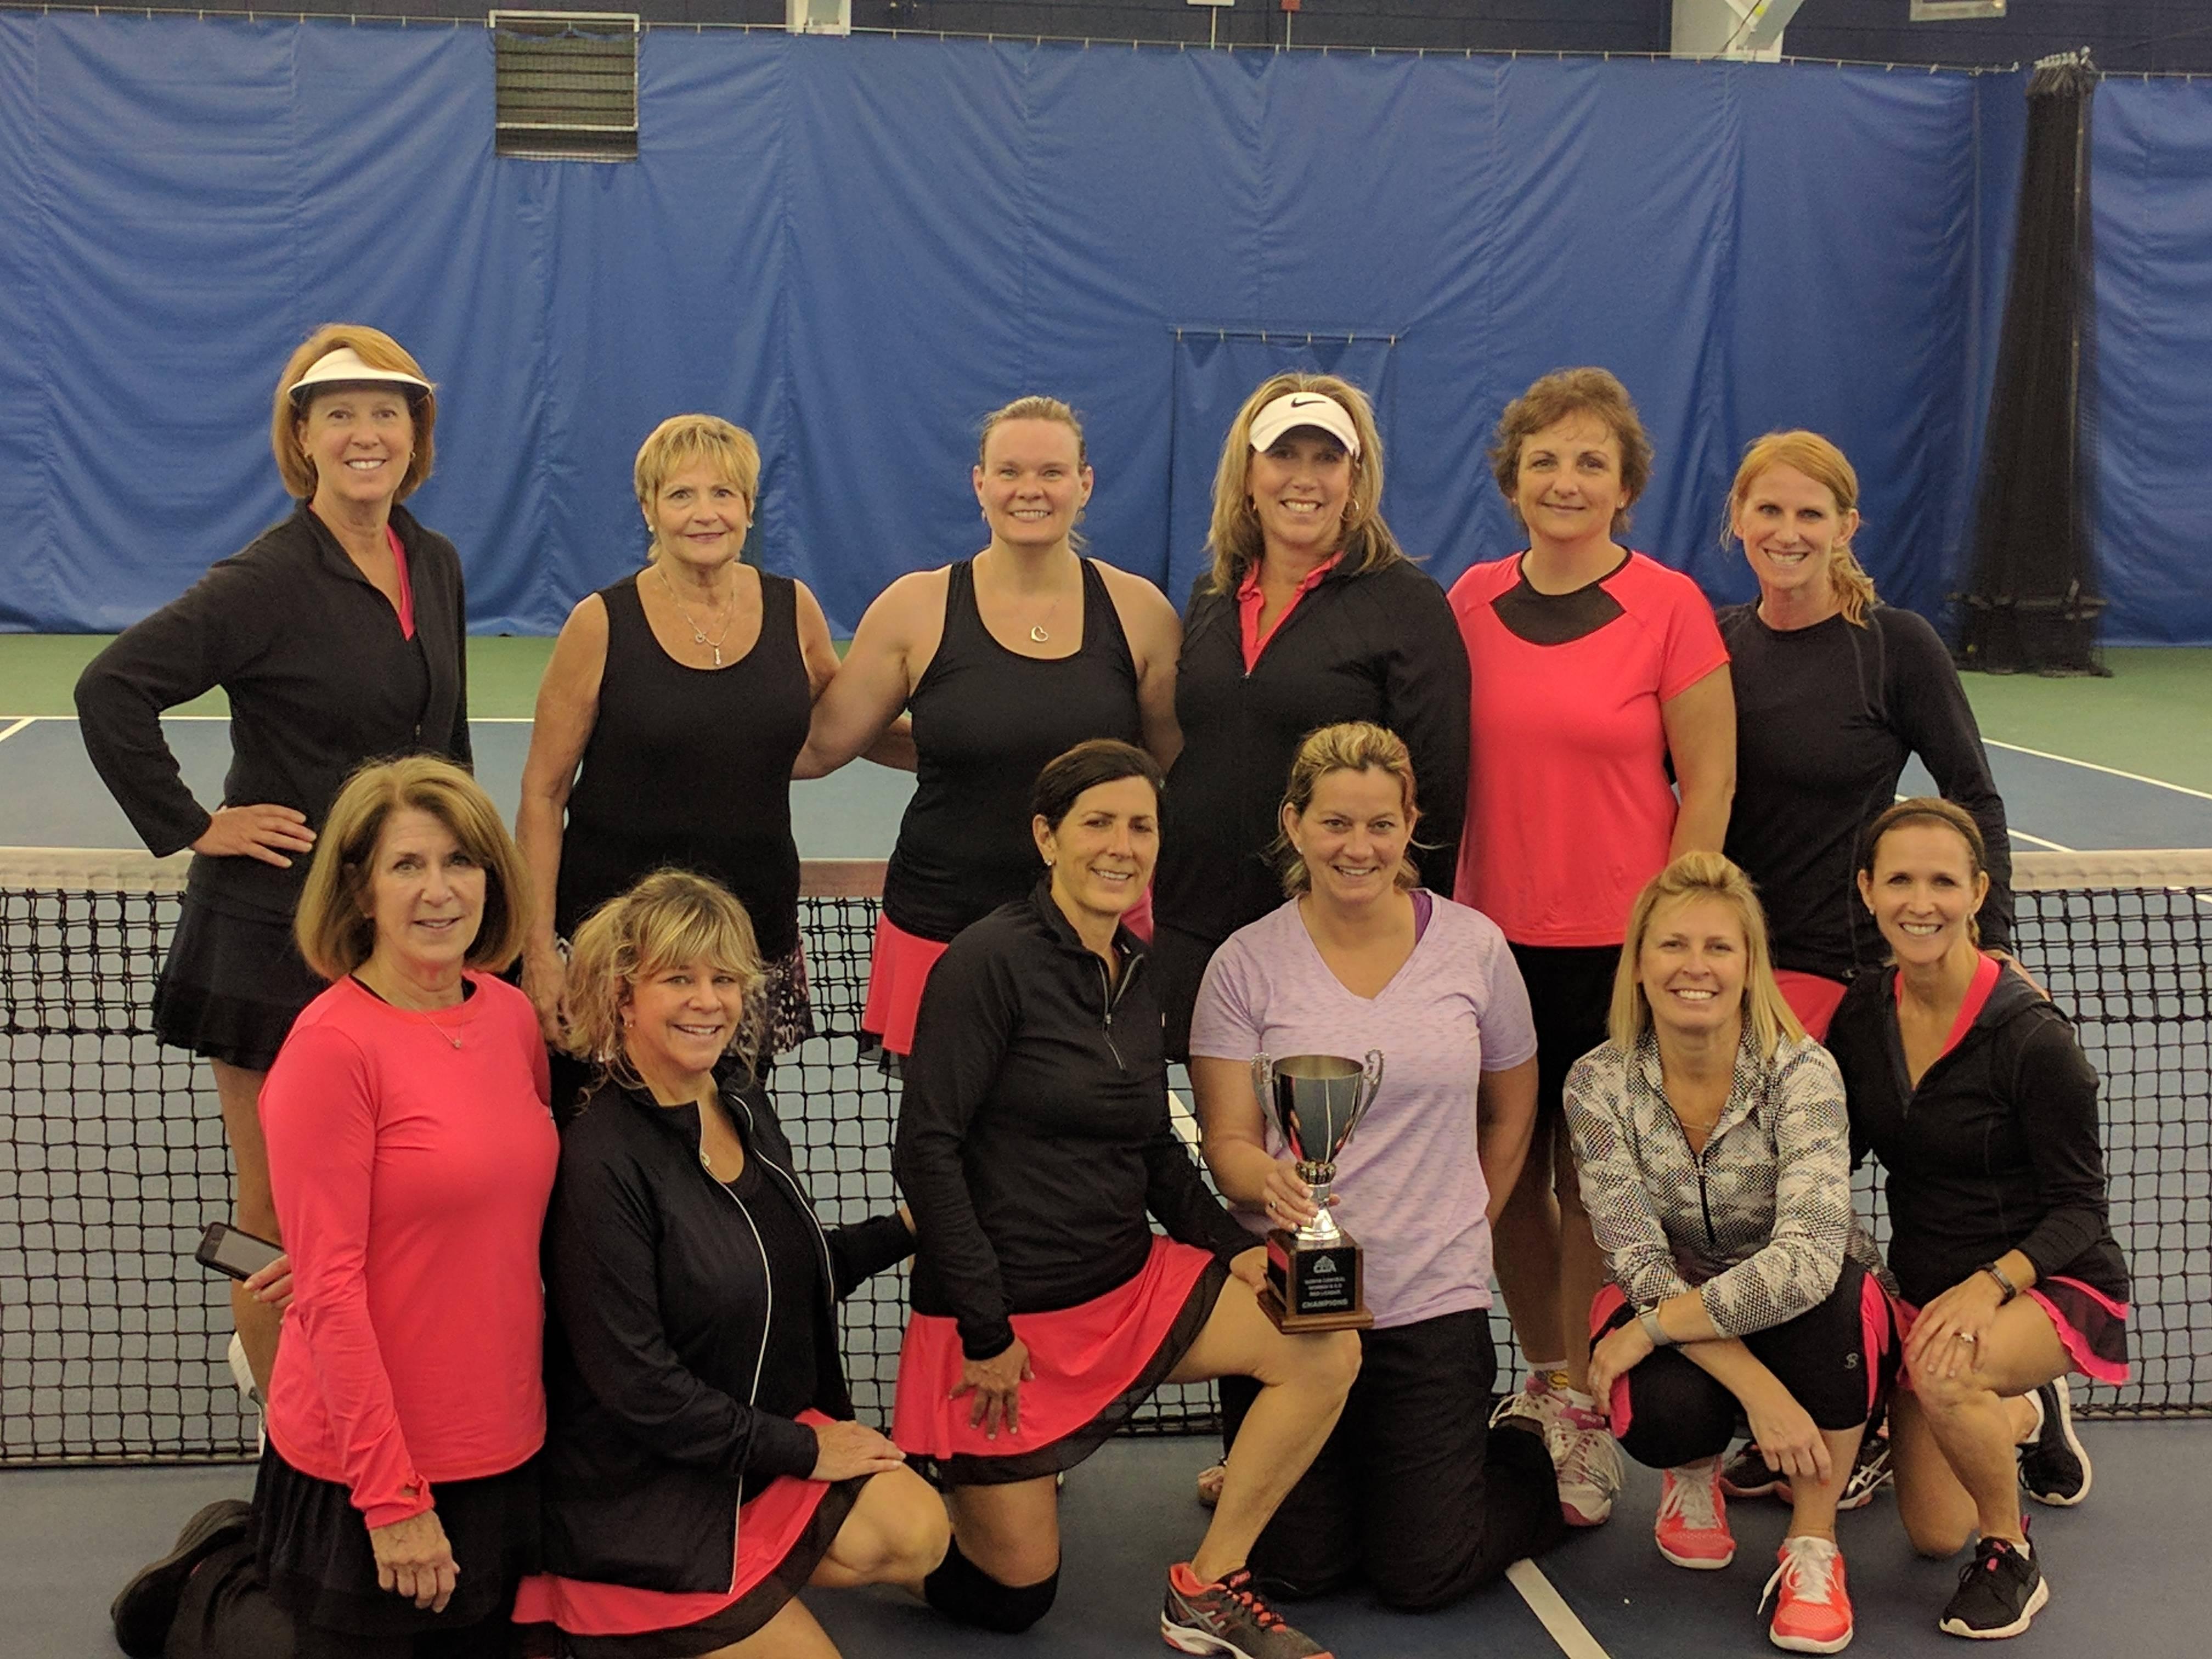 4.5 Women's Team Wins North/Central Crown